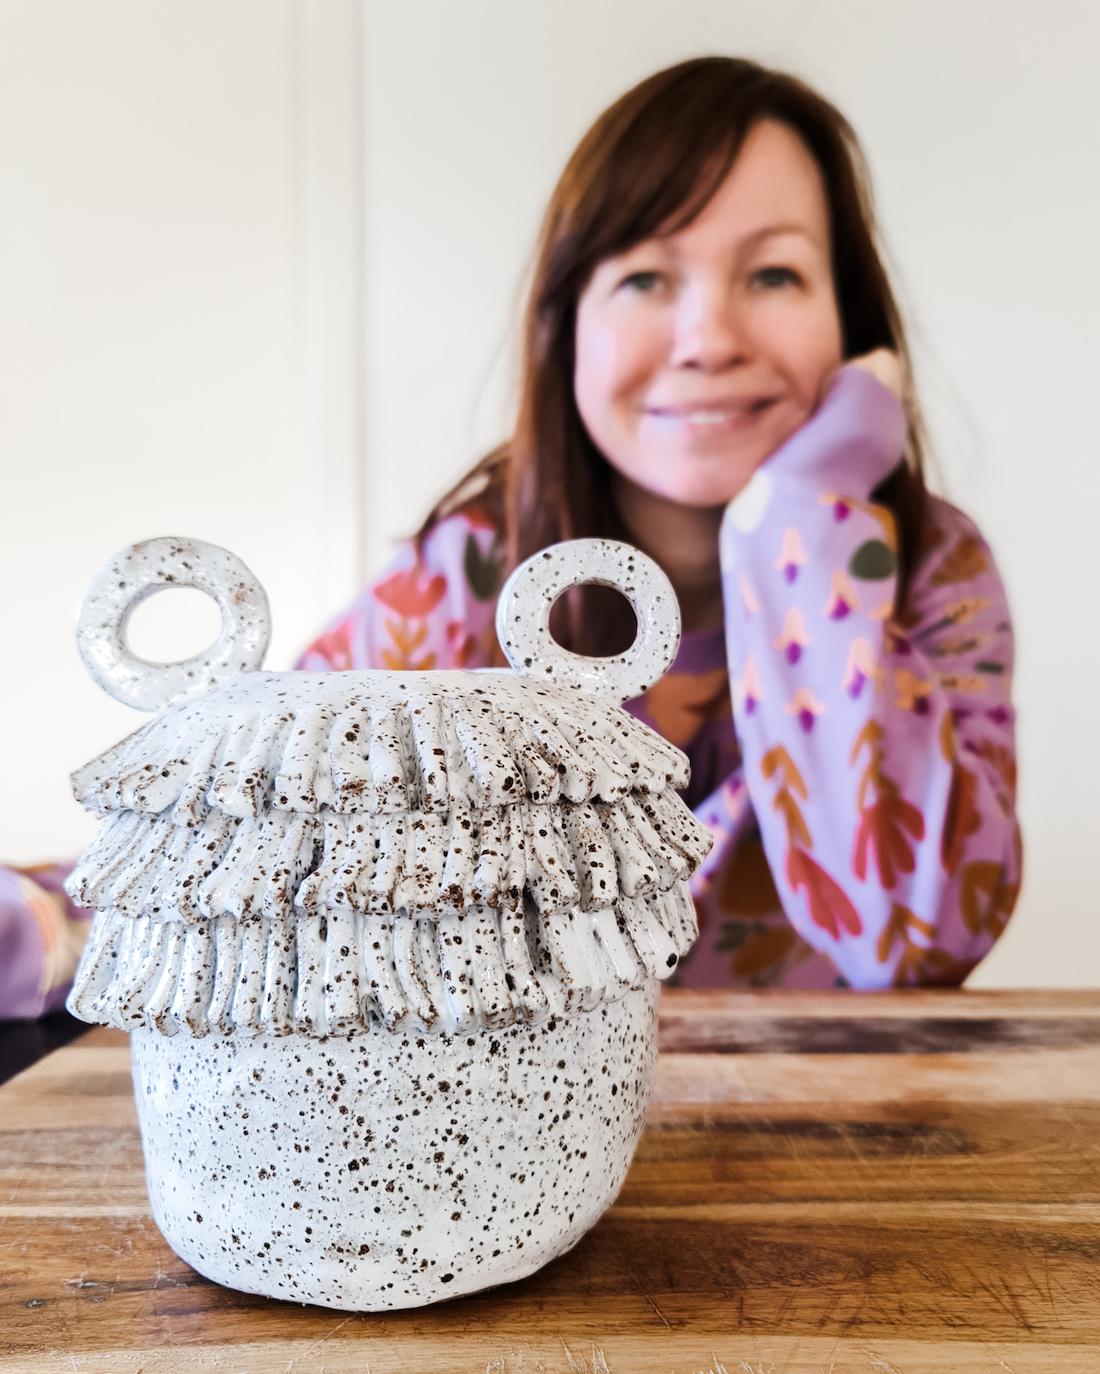 The Seasonal Ceramicist_Emma Fleetwood_portait option_imperfect textural ceramics